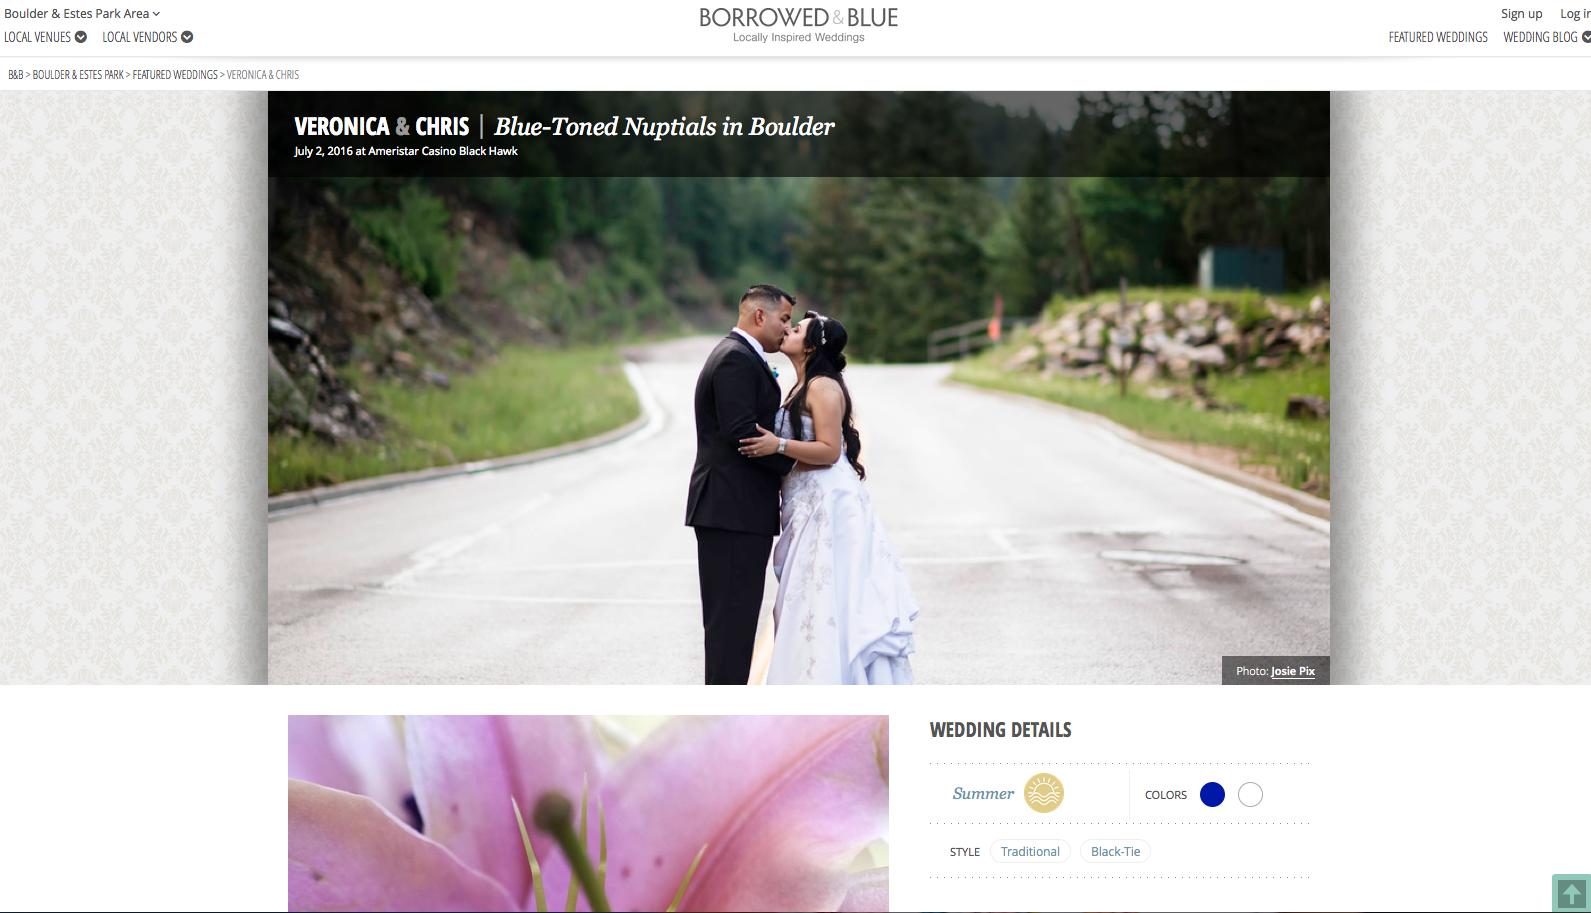 http://www.borrowedandblue.com/boulder/weddings/veronica-chris--2